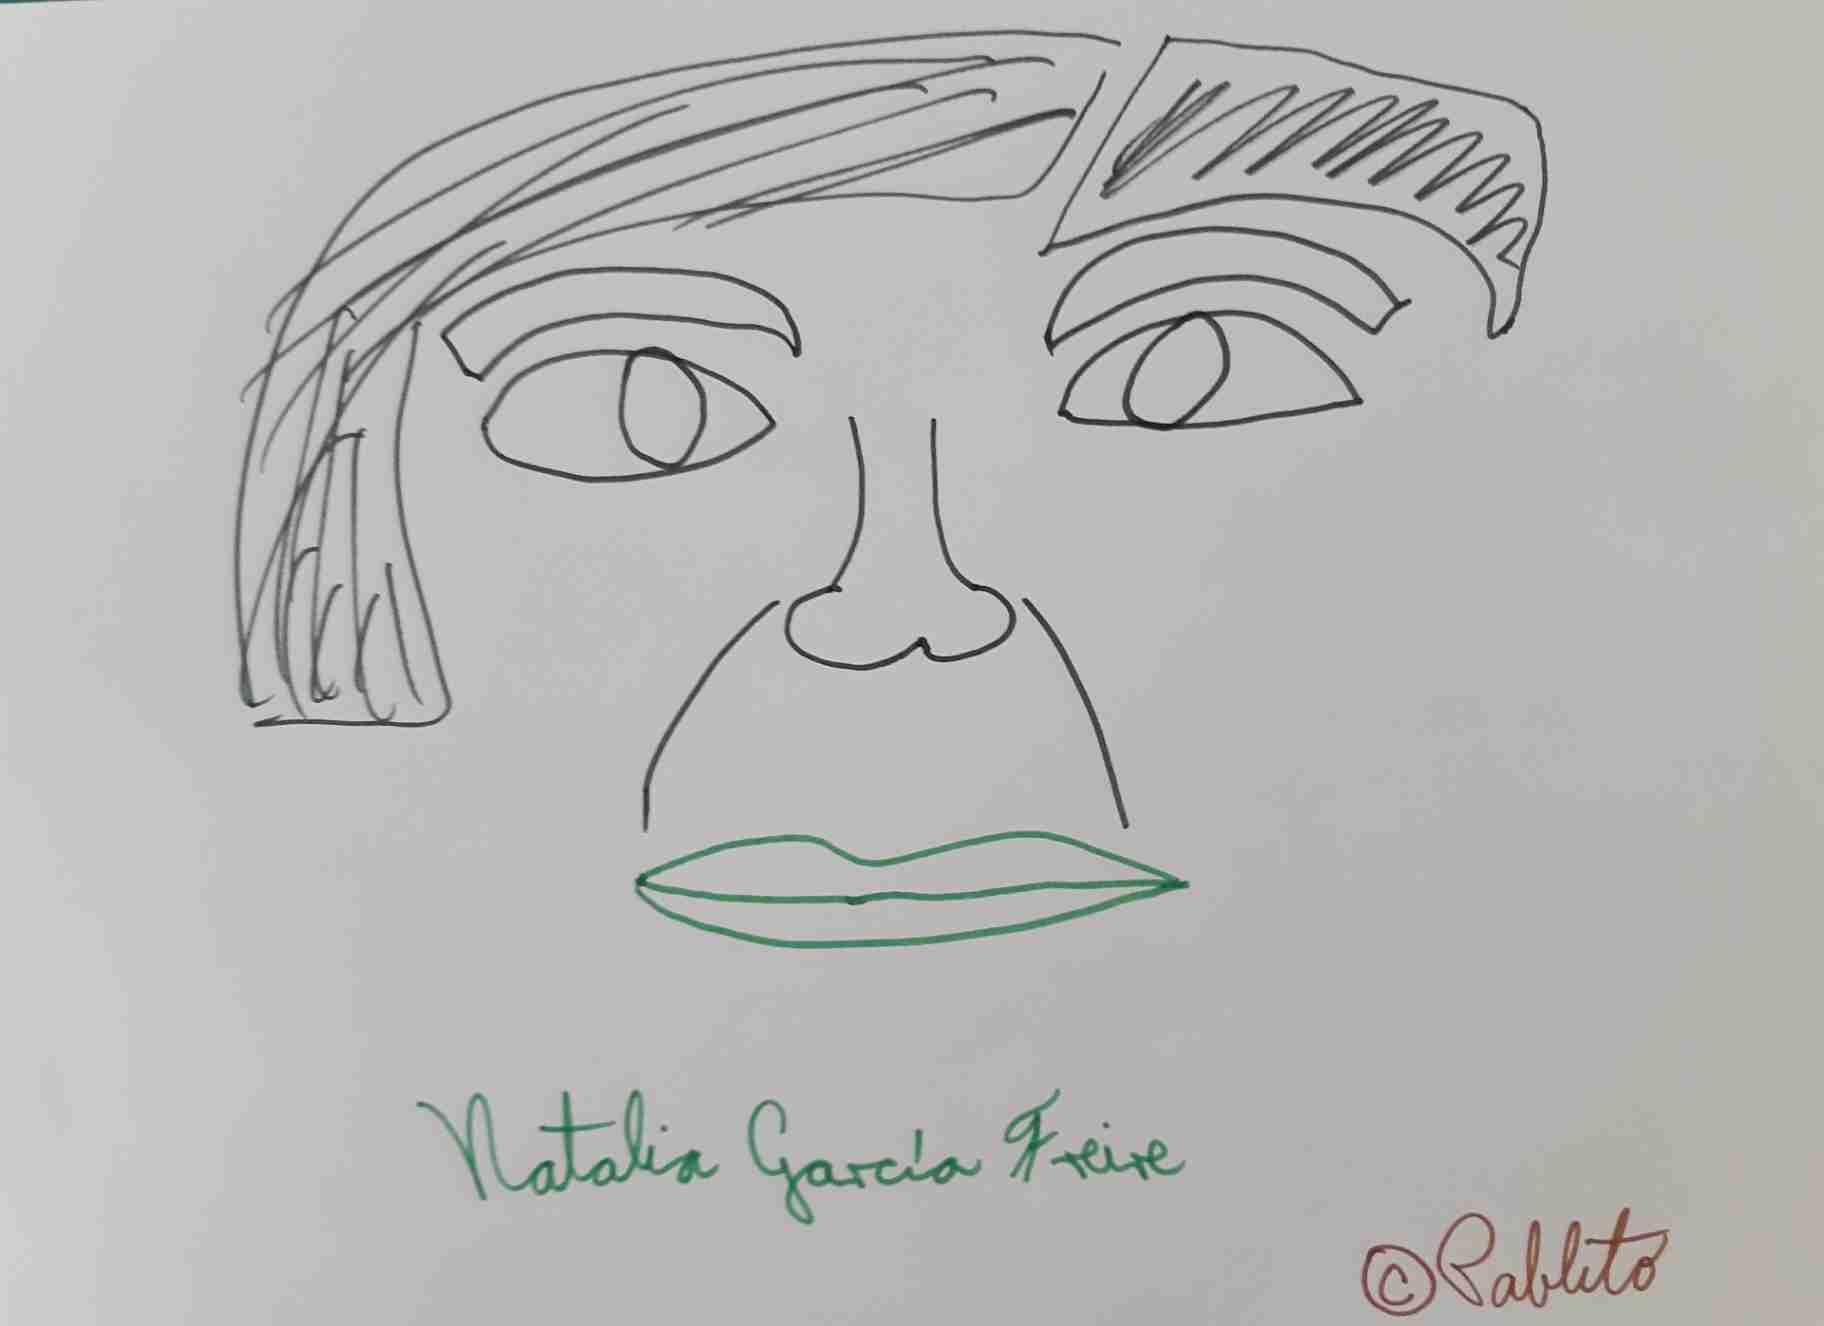 Obra: Natalia García Freire